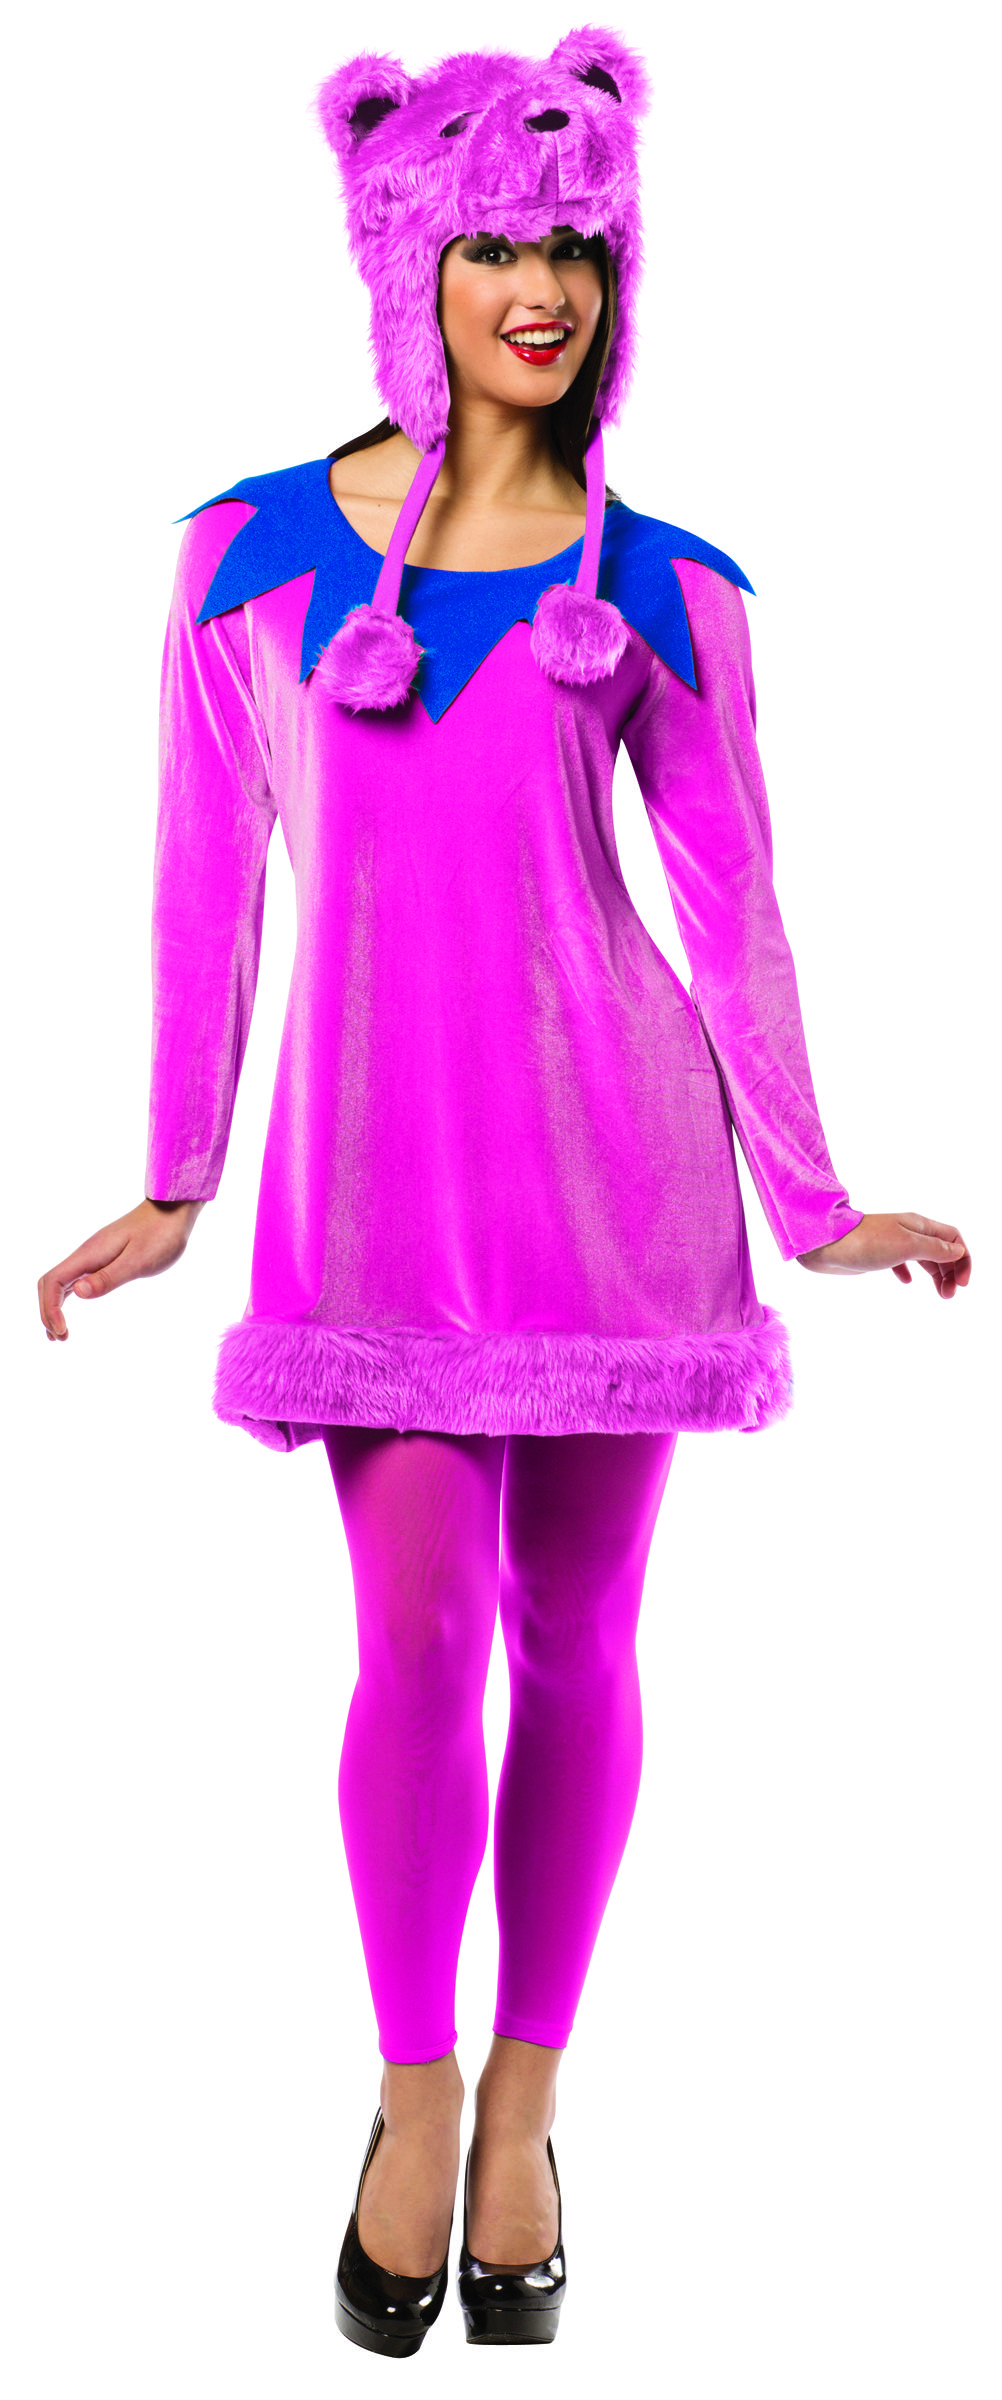 #4995 Grateful Dead Bear Dress Pink #bear #gratefuldead #halloween #dancingbear #orangehat  sc 1 st  Pinterest & 4995 Grateful Dead Bear Dress Pink #bear #gratefuldead #halloween ...